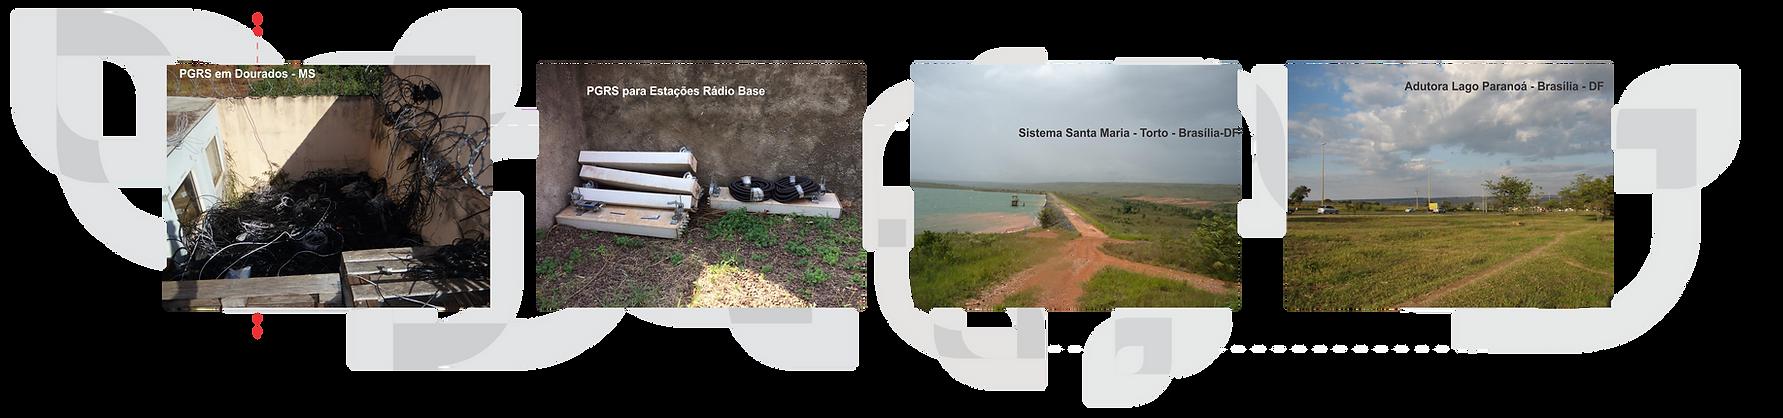 Figuras fundo projetos saneamento.png